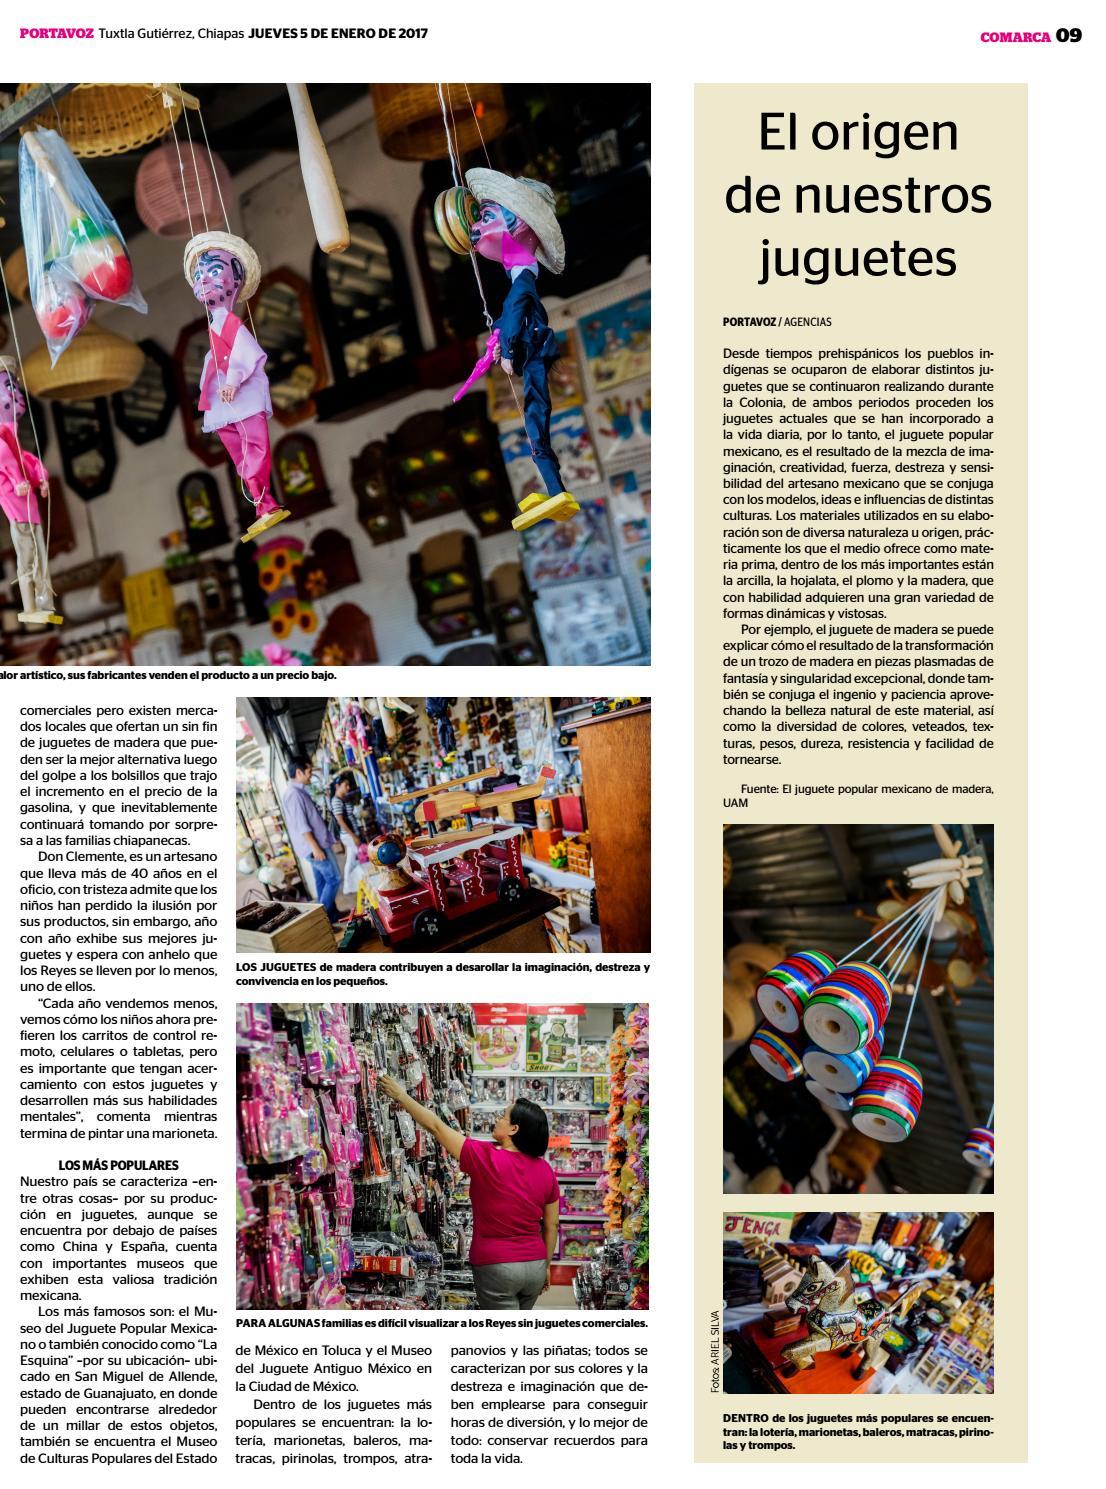 5ene2017 Issuu Portavoz By Portavoz Diario 5ene2017 tsxQdBhrC